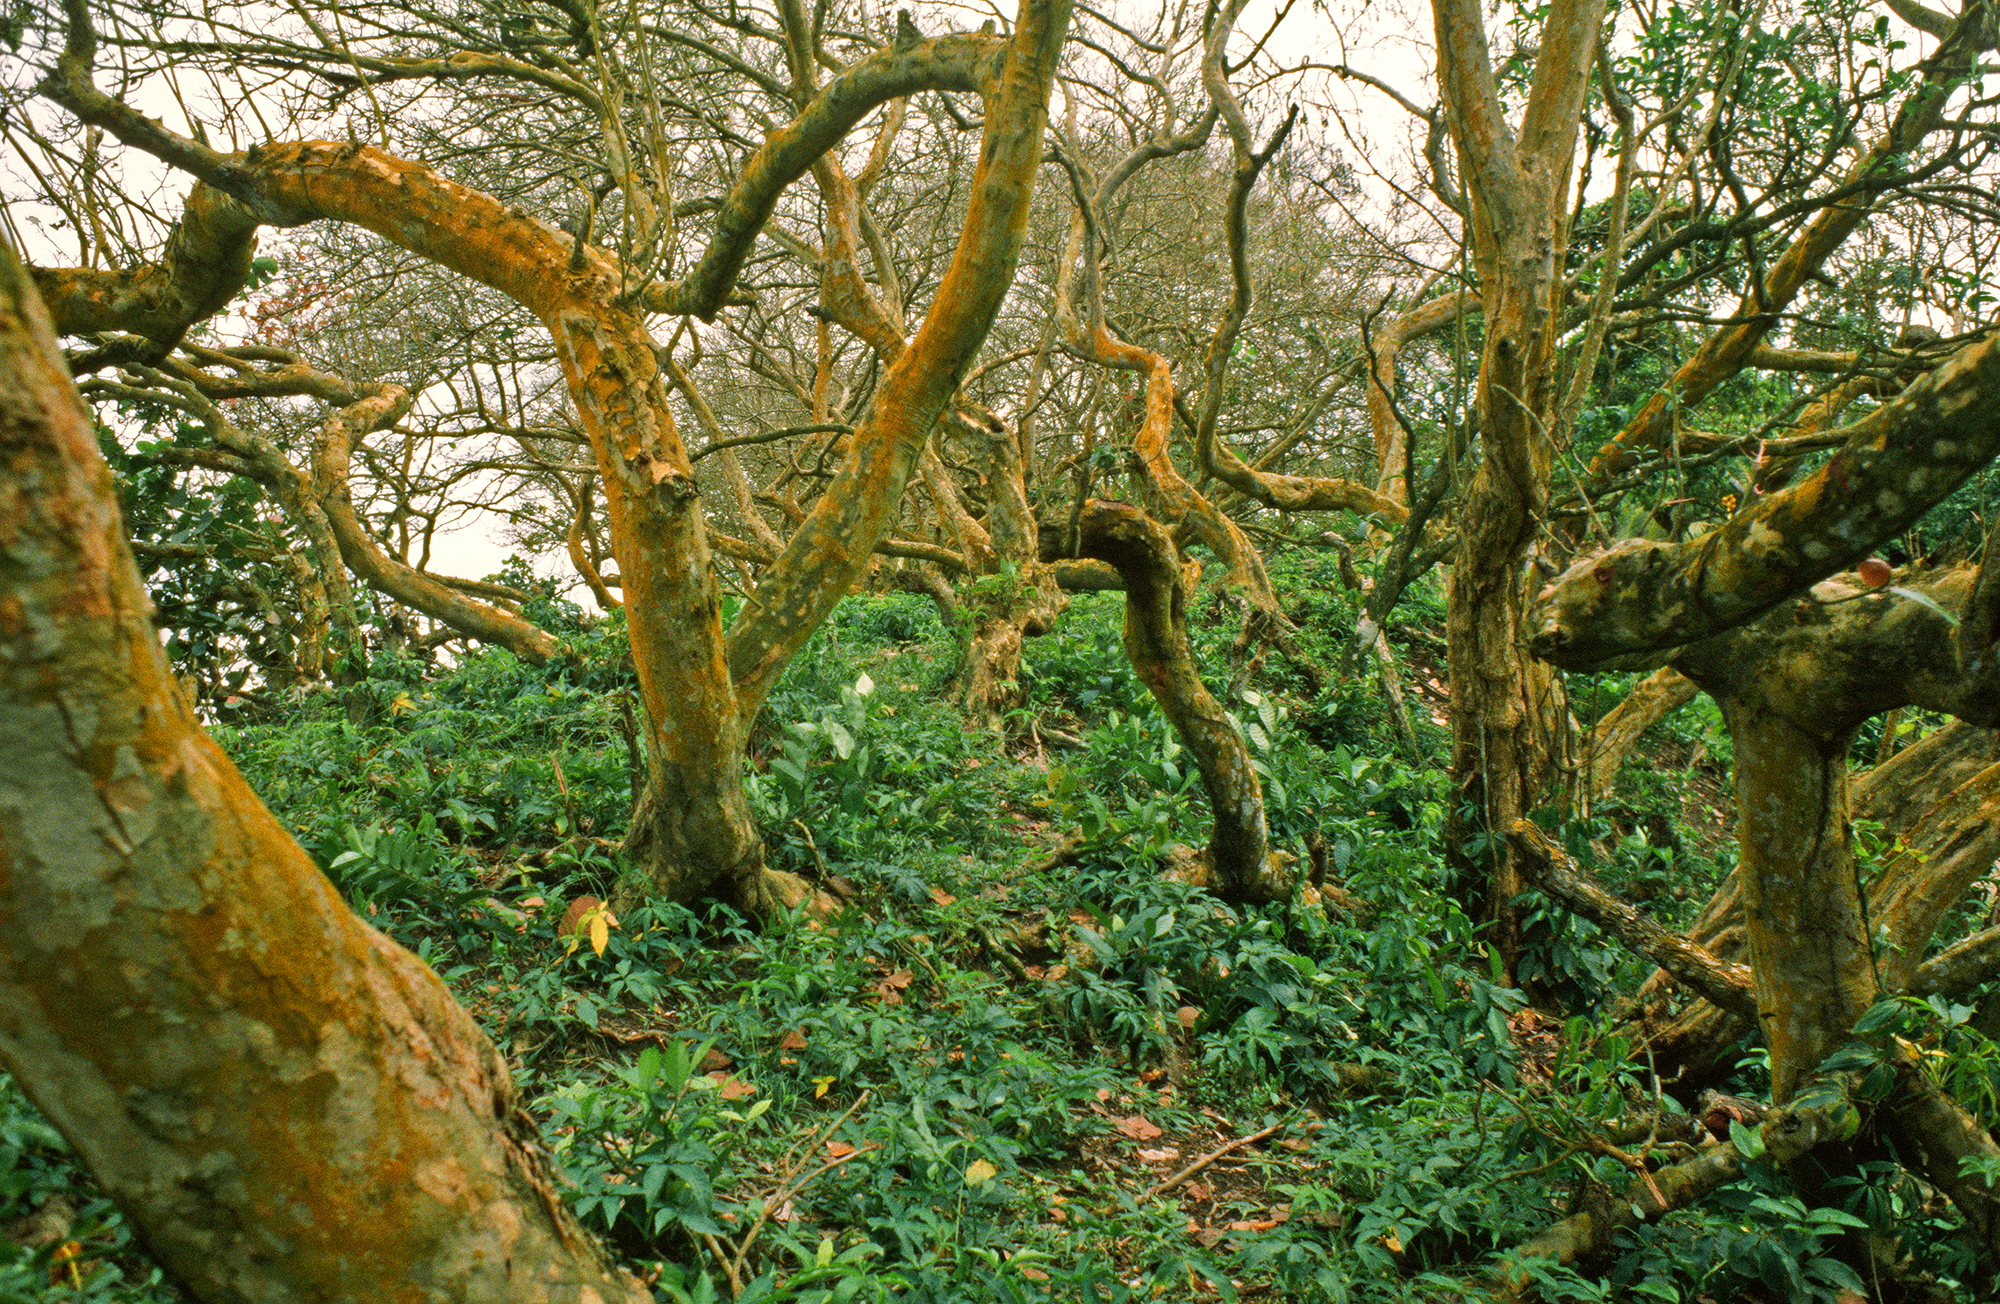 YELLOW SKINNED TREES